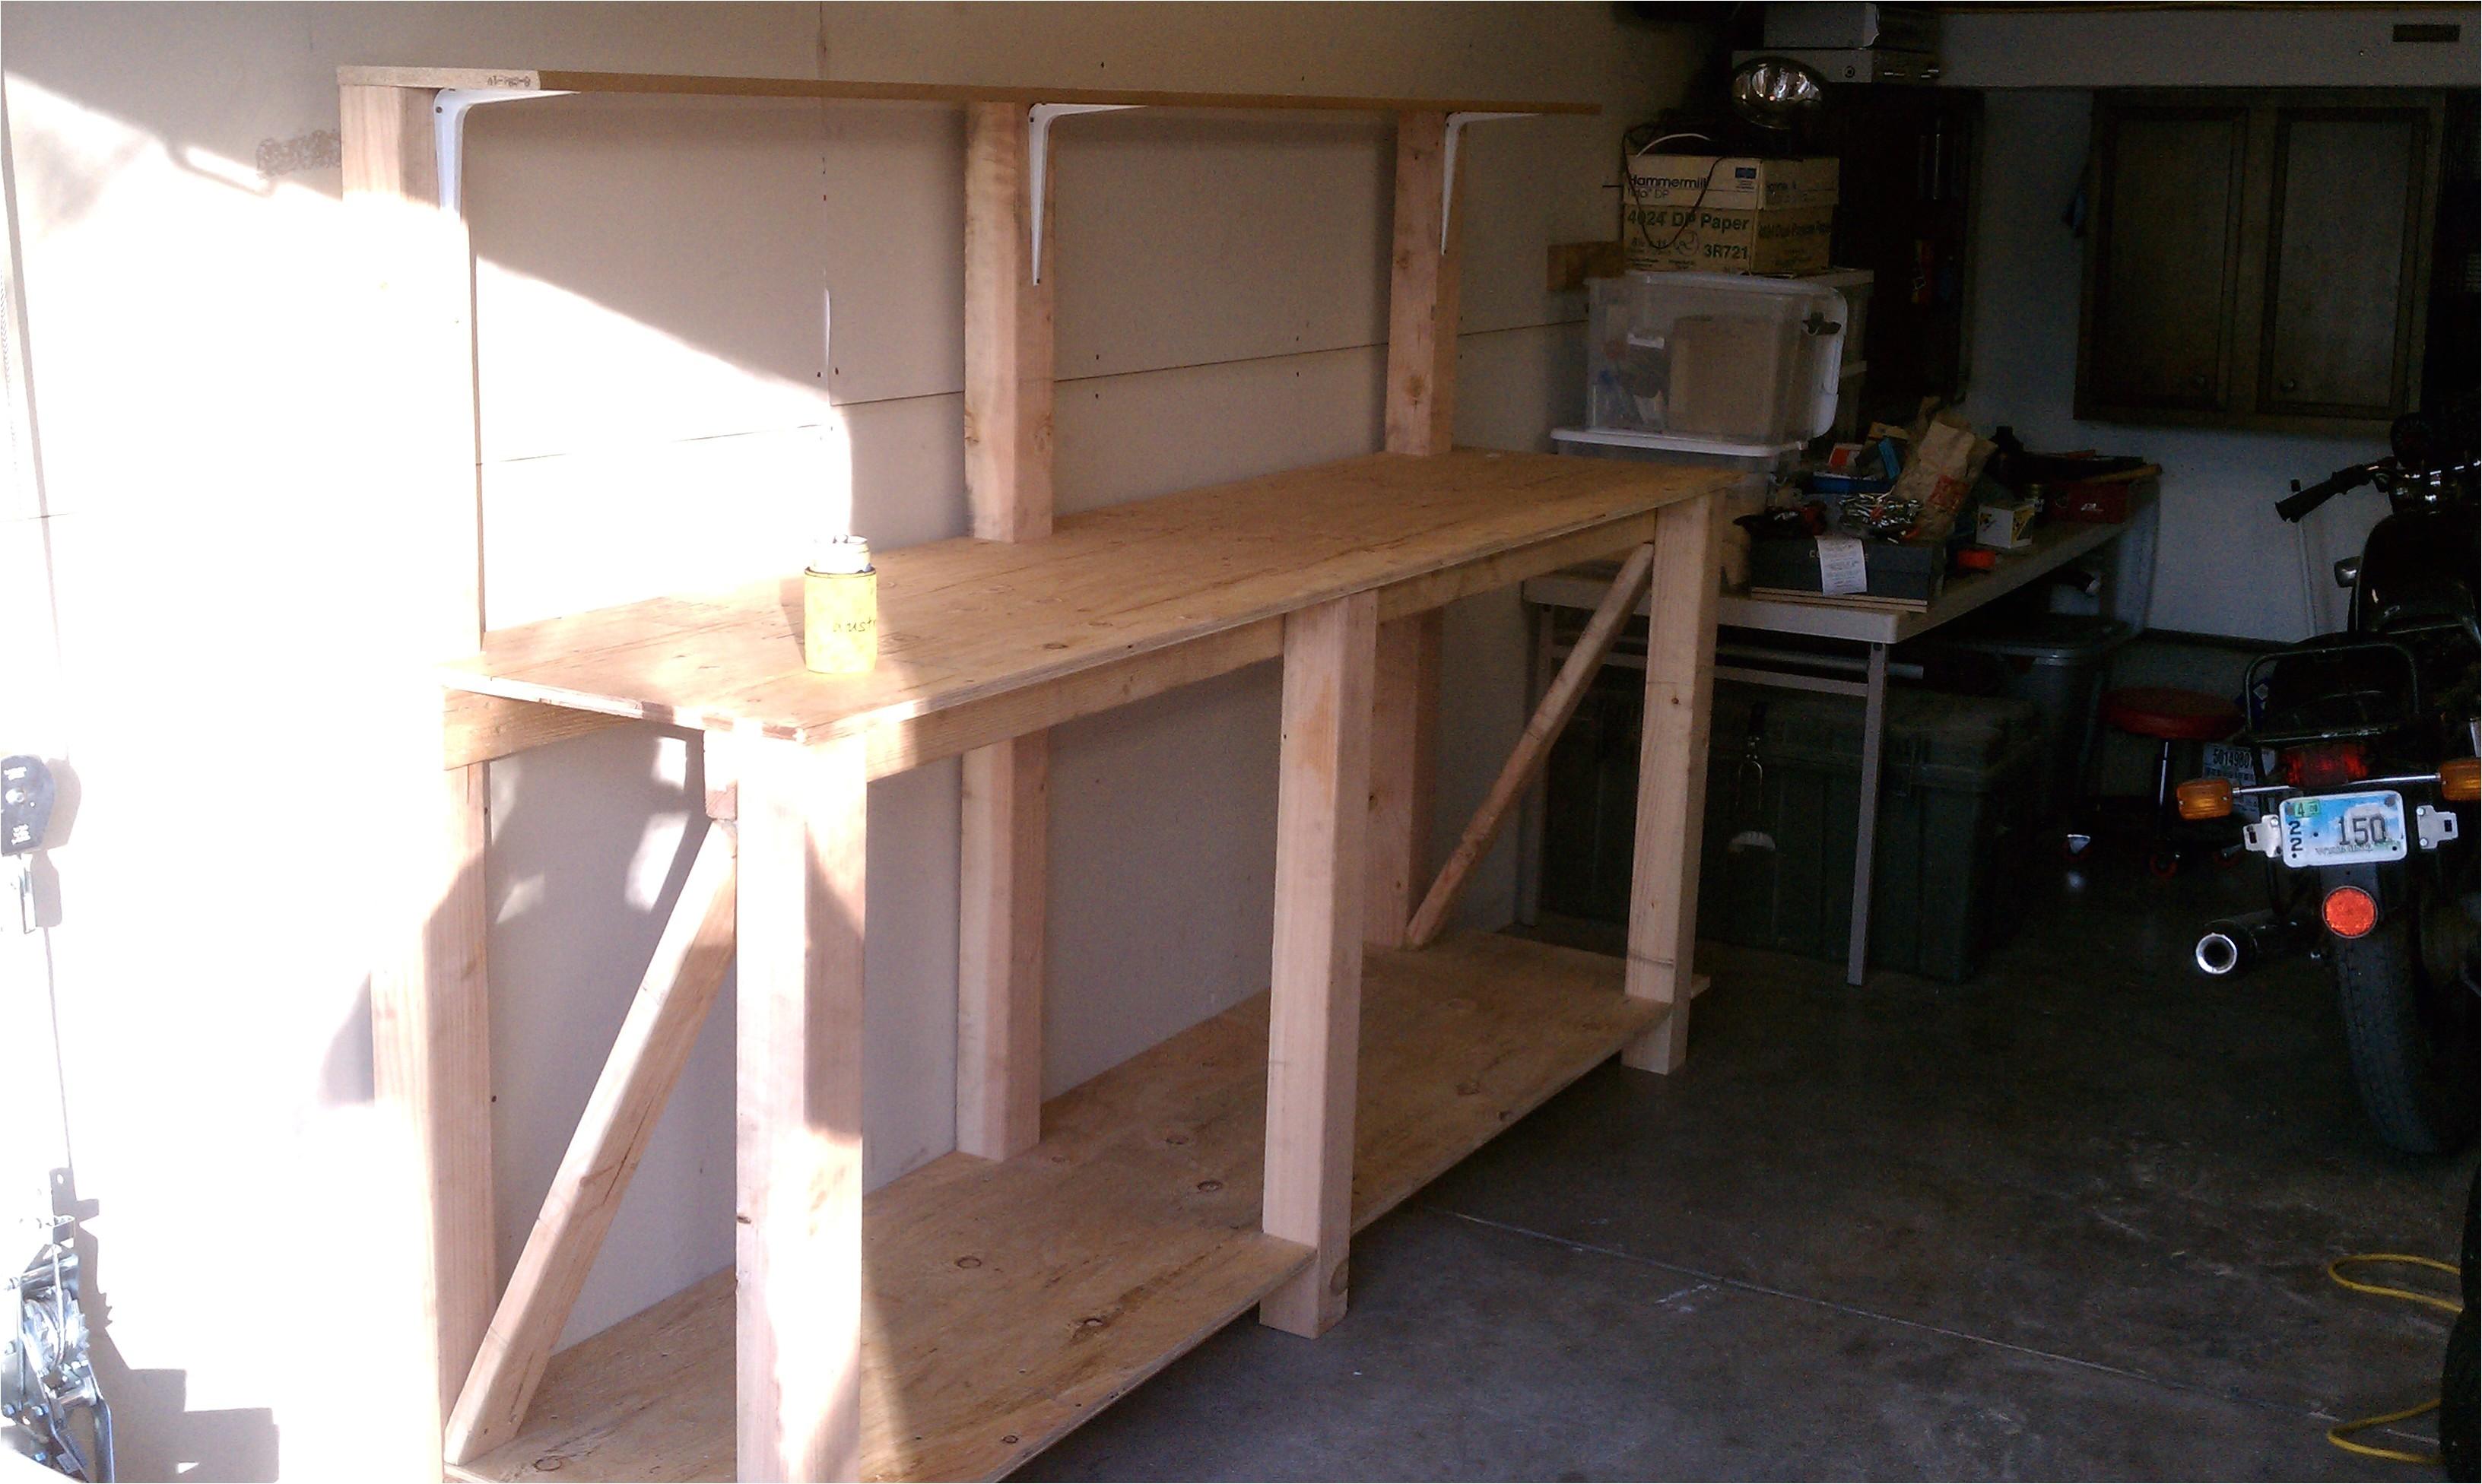 diy woodworking bench home depot download plans potting bench